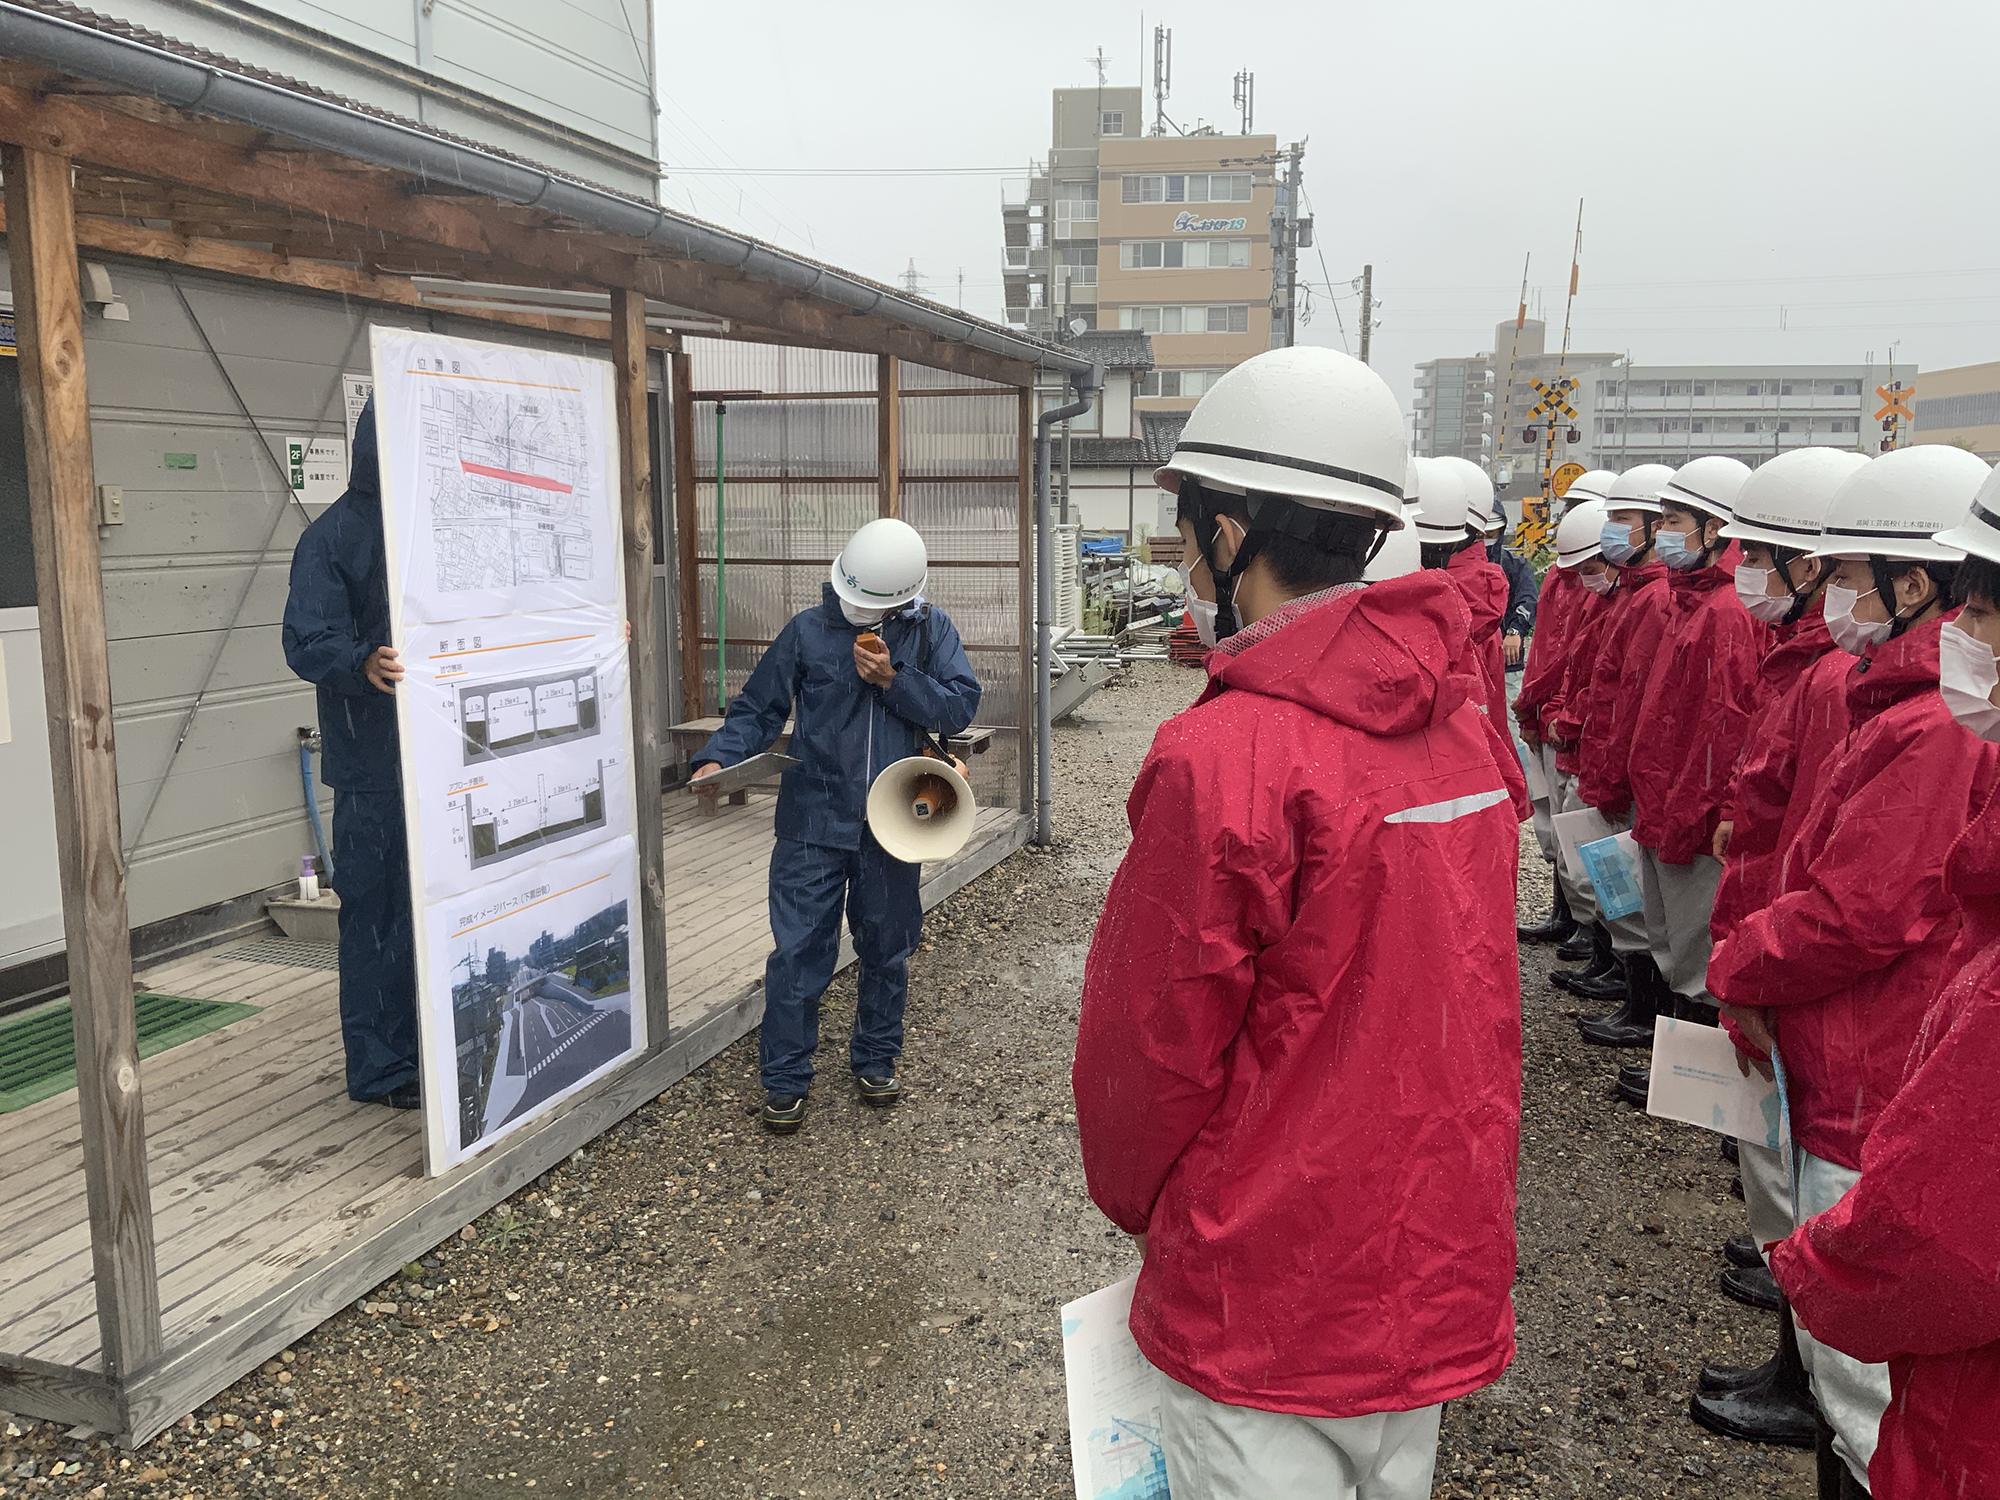 高岡市道路整備課の四津章宏主任が工事を説明